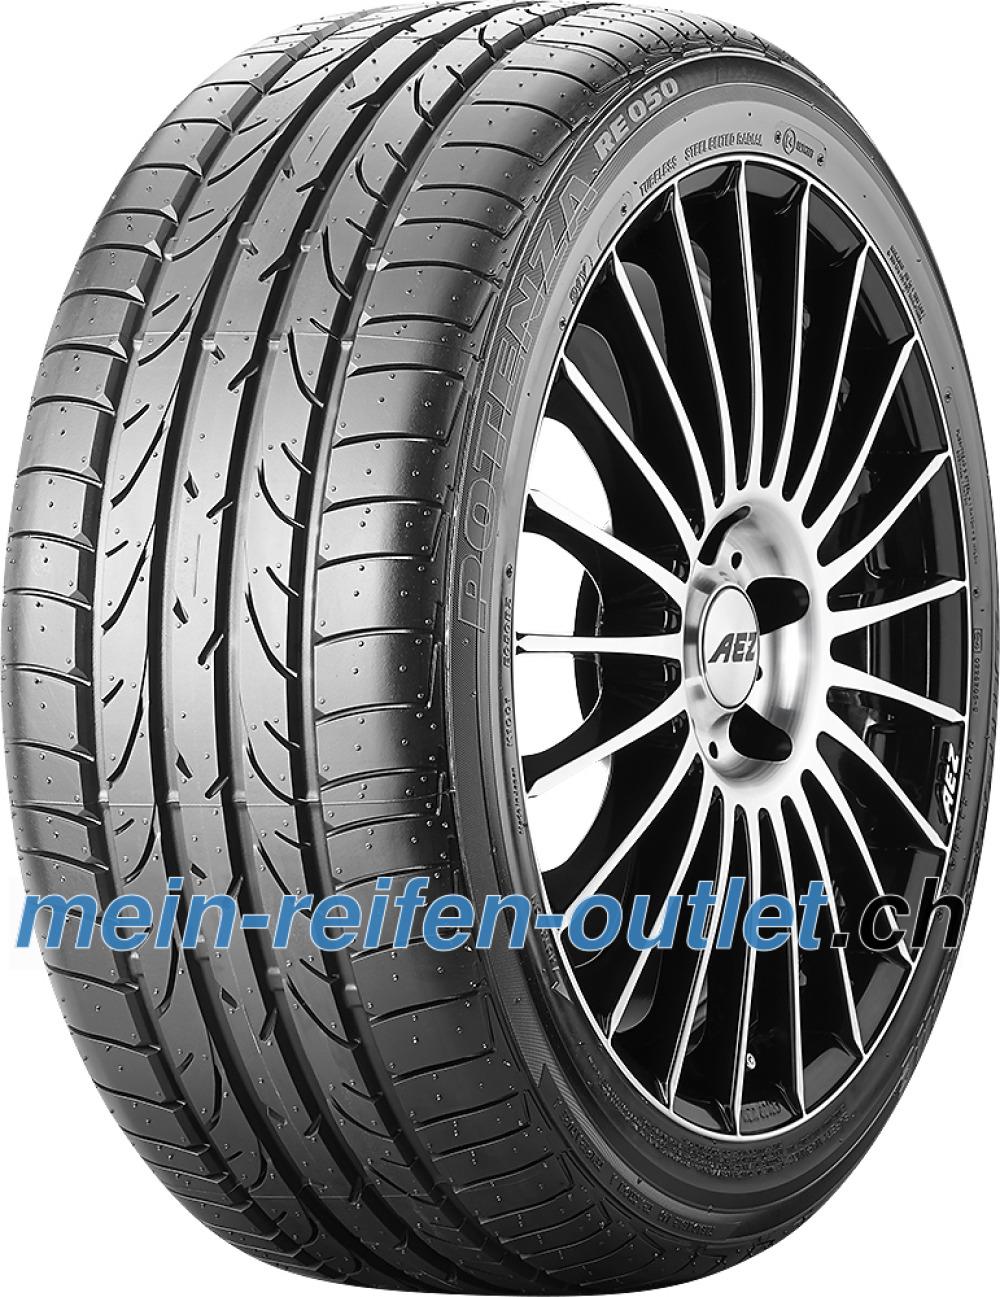 Bridgestone Potenza RE 050 RFT ( 245/45 R17 95Y runflat, *, mit Felgenschutz (MFS) )